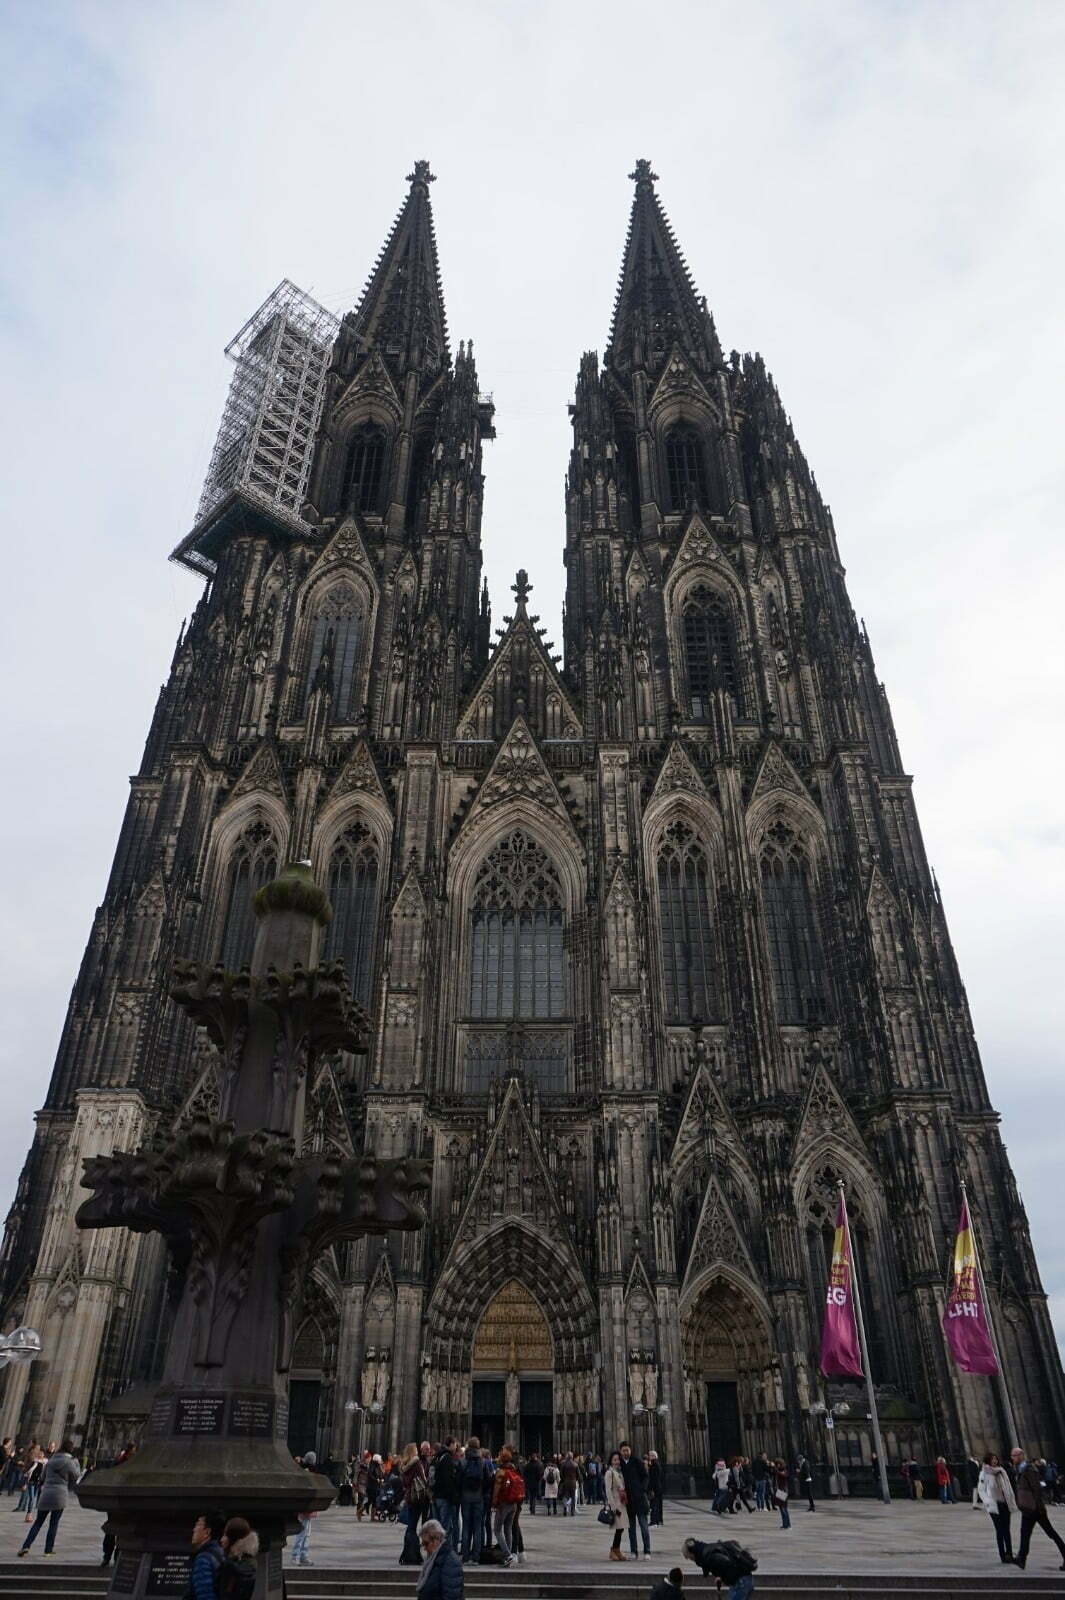 Cologne's Cathedral, Love Lock Bridge & Koln Triangle: A Walk Of Surprises 5